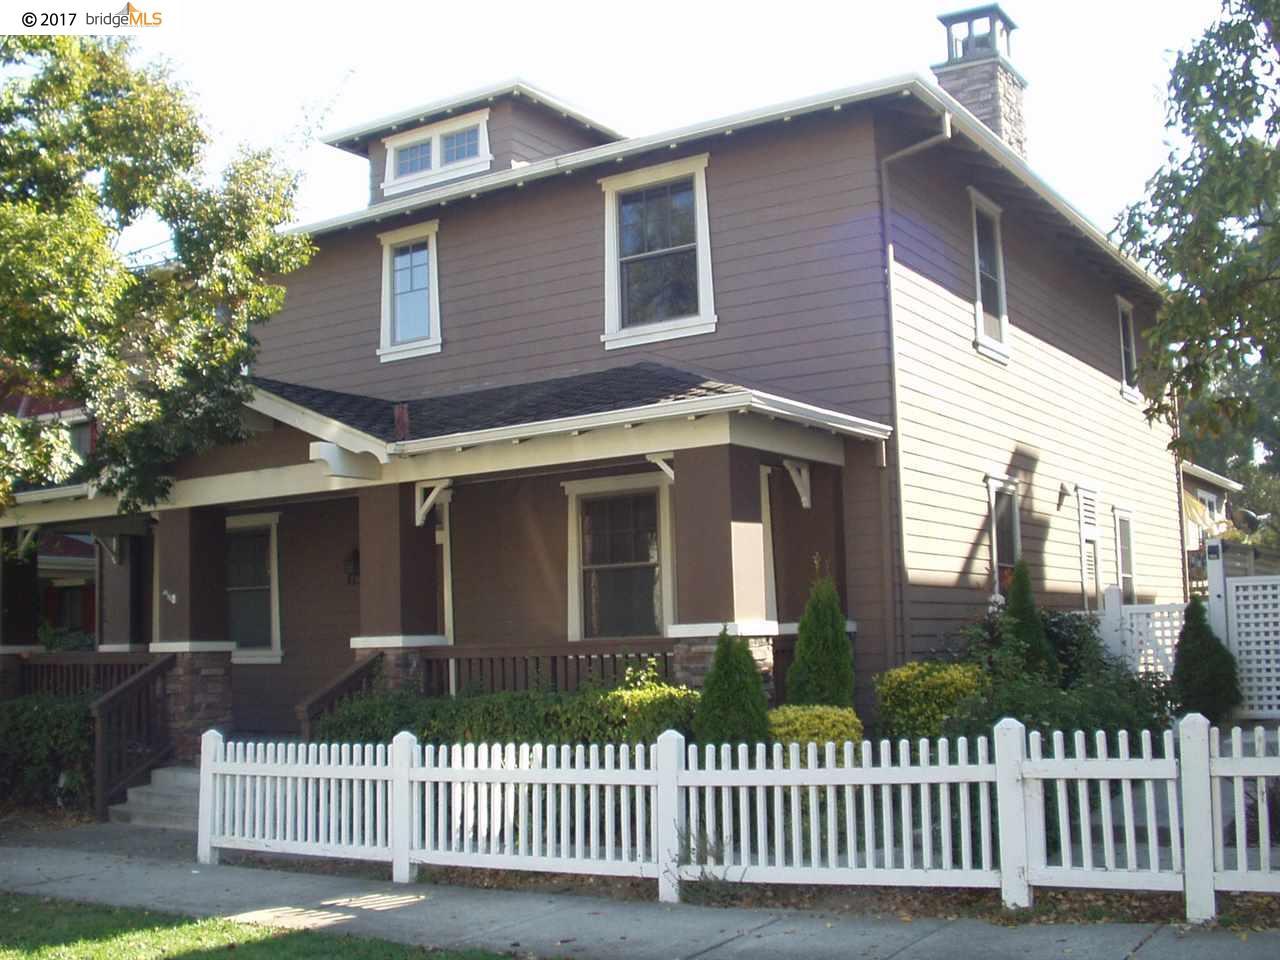 Single Family Home for Rent at 1135 Promenade Street 1135 Promenade Street Hercules, California 94547 United States